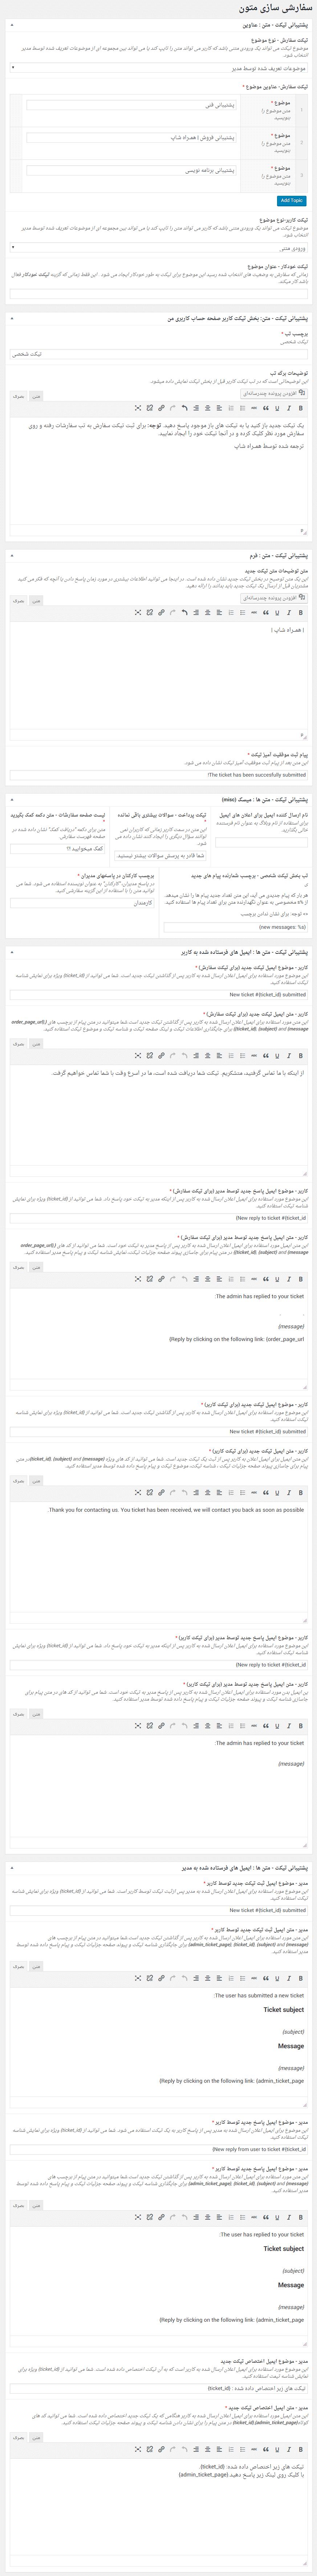 تنظیمات پیشرفته و ورودی متن افزونه WooCommerce Support Ticket System